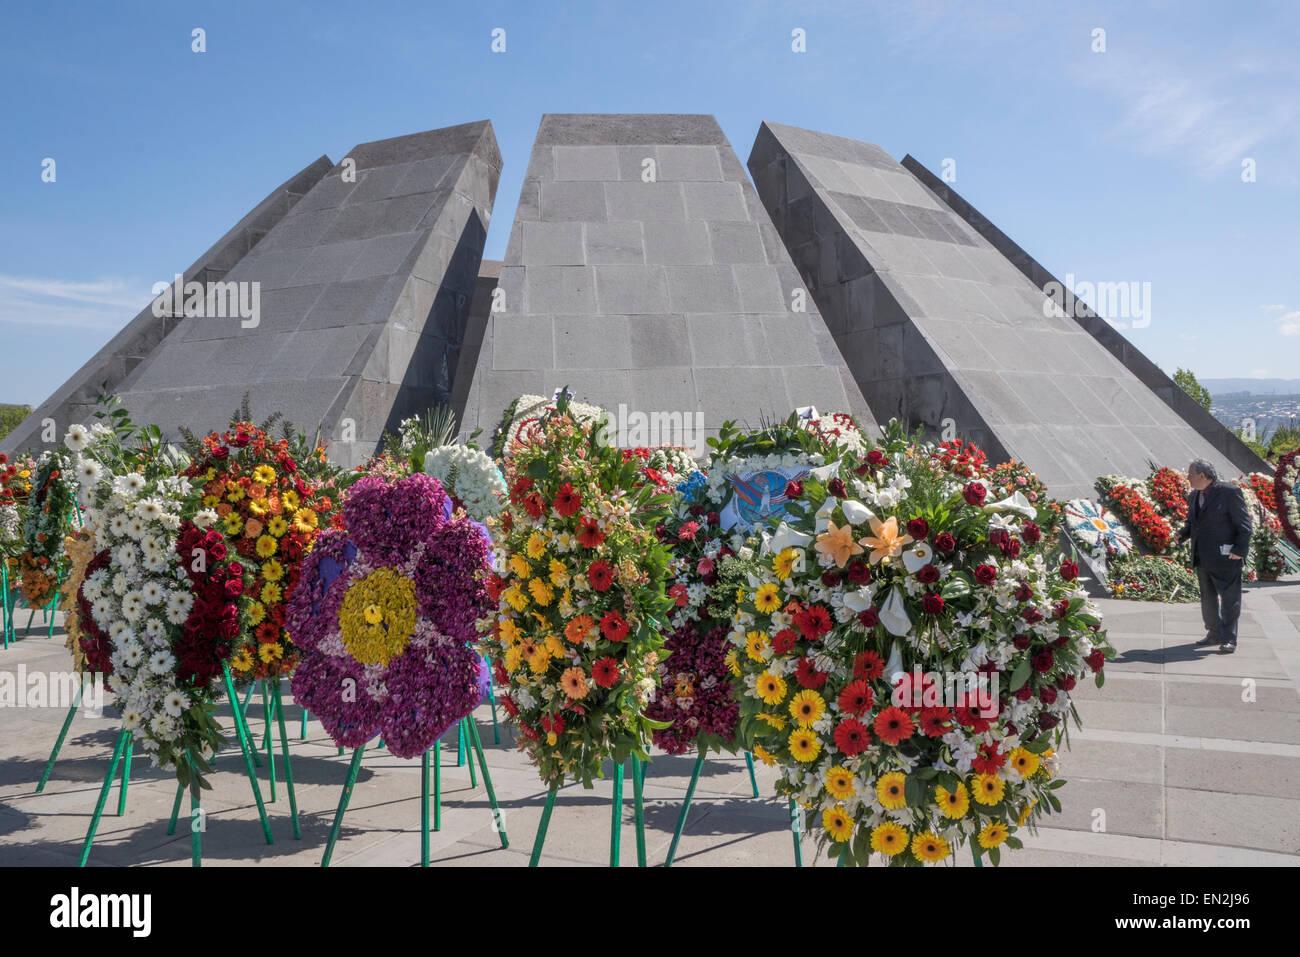 Yerevan, Armenia. 25th Apr, 2015. Armenian Genocide Museum during 100th Anniversary Commemoration Credit:  Dennis - Stock Image